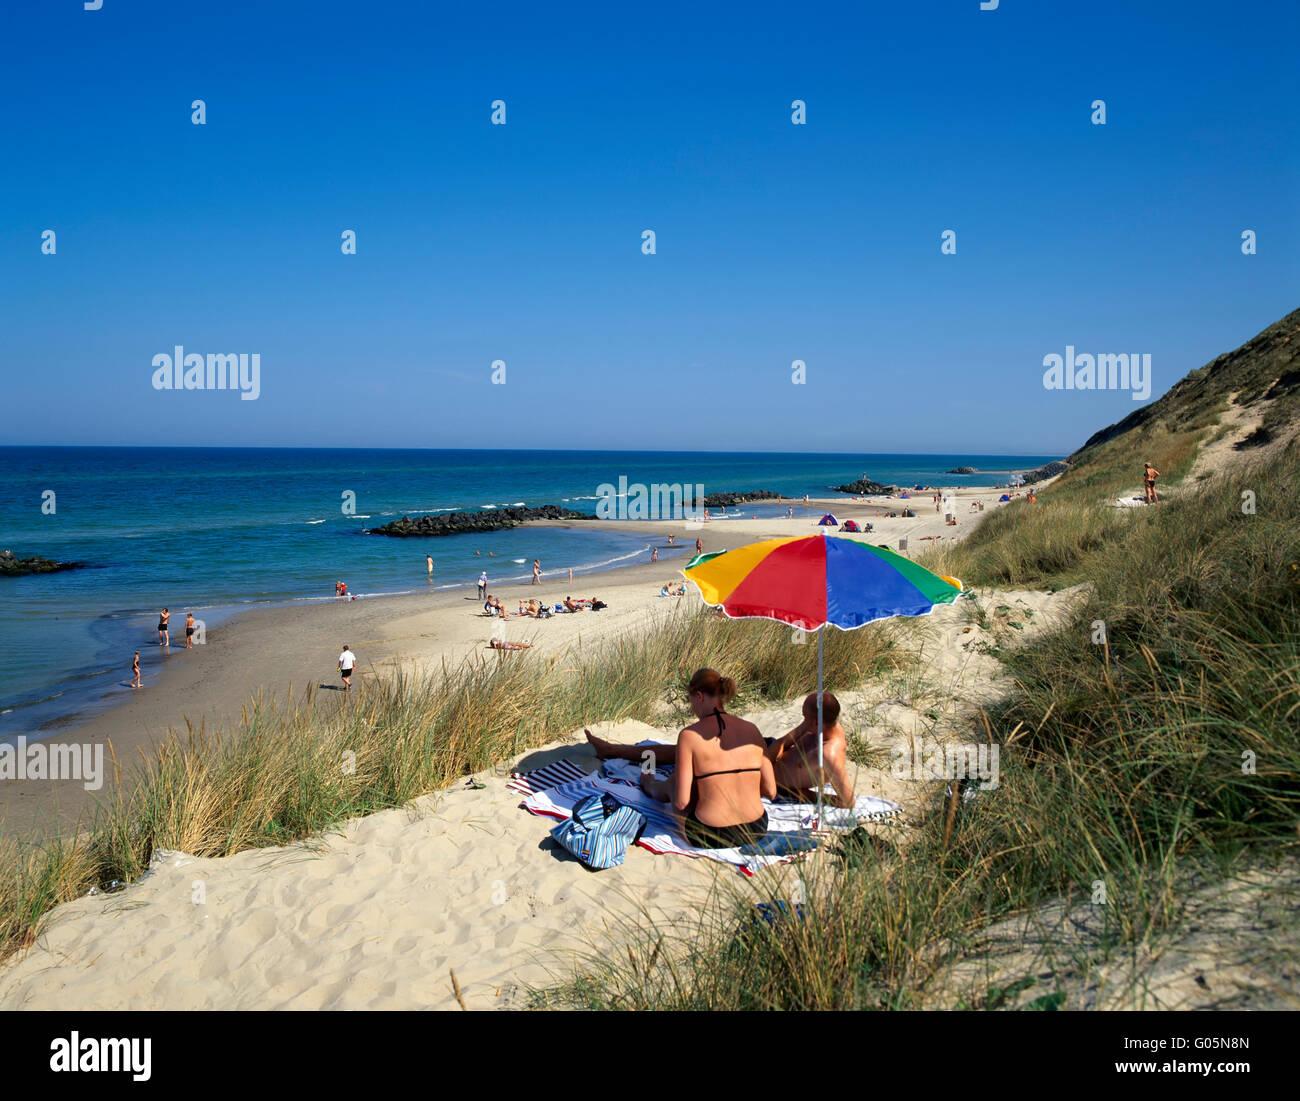 Loenstrup beach,  northern Jutland, Denmark, Scandinavia, Europe - Stock Image